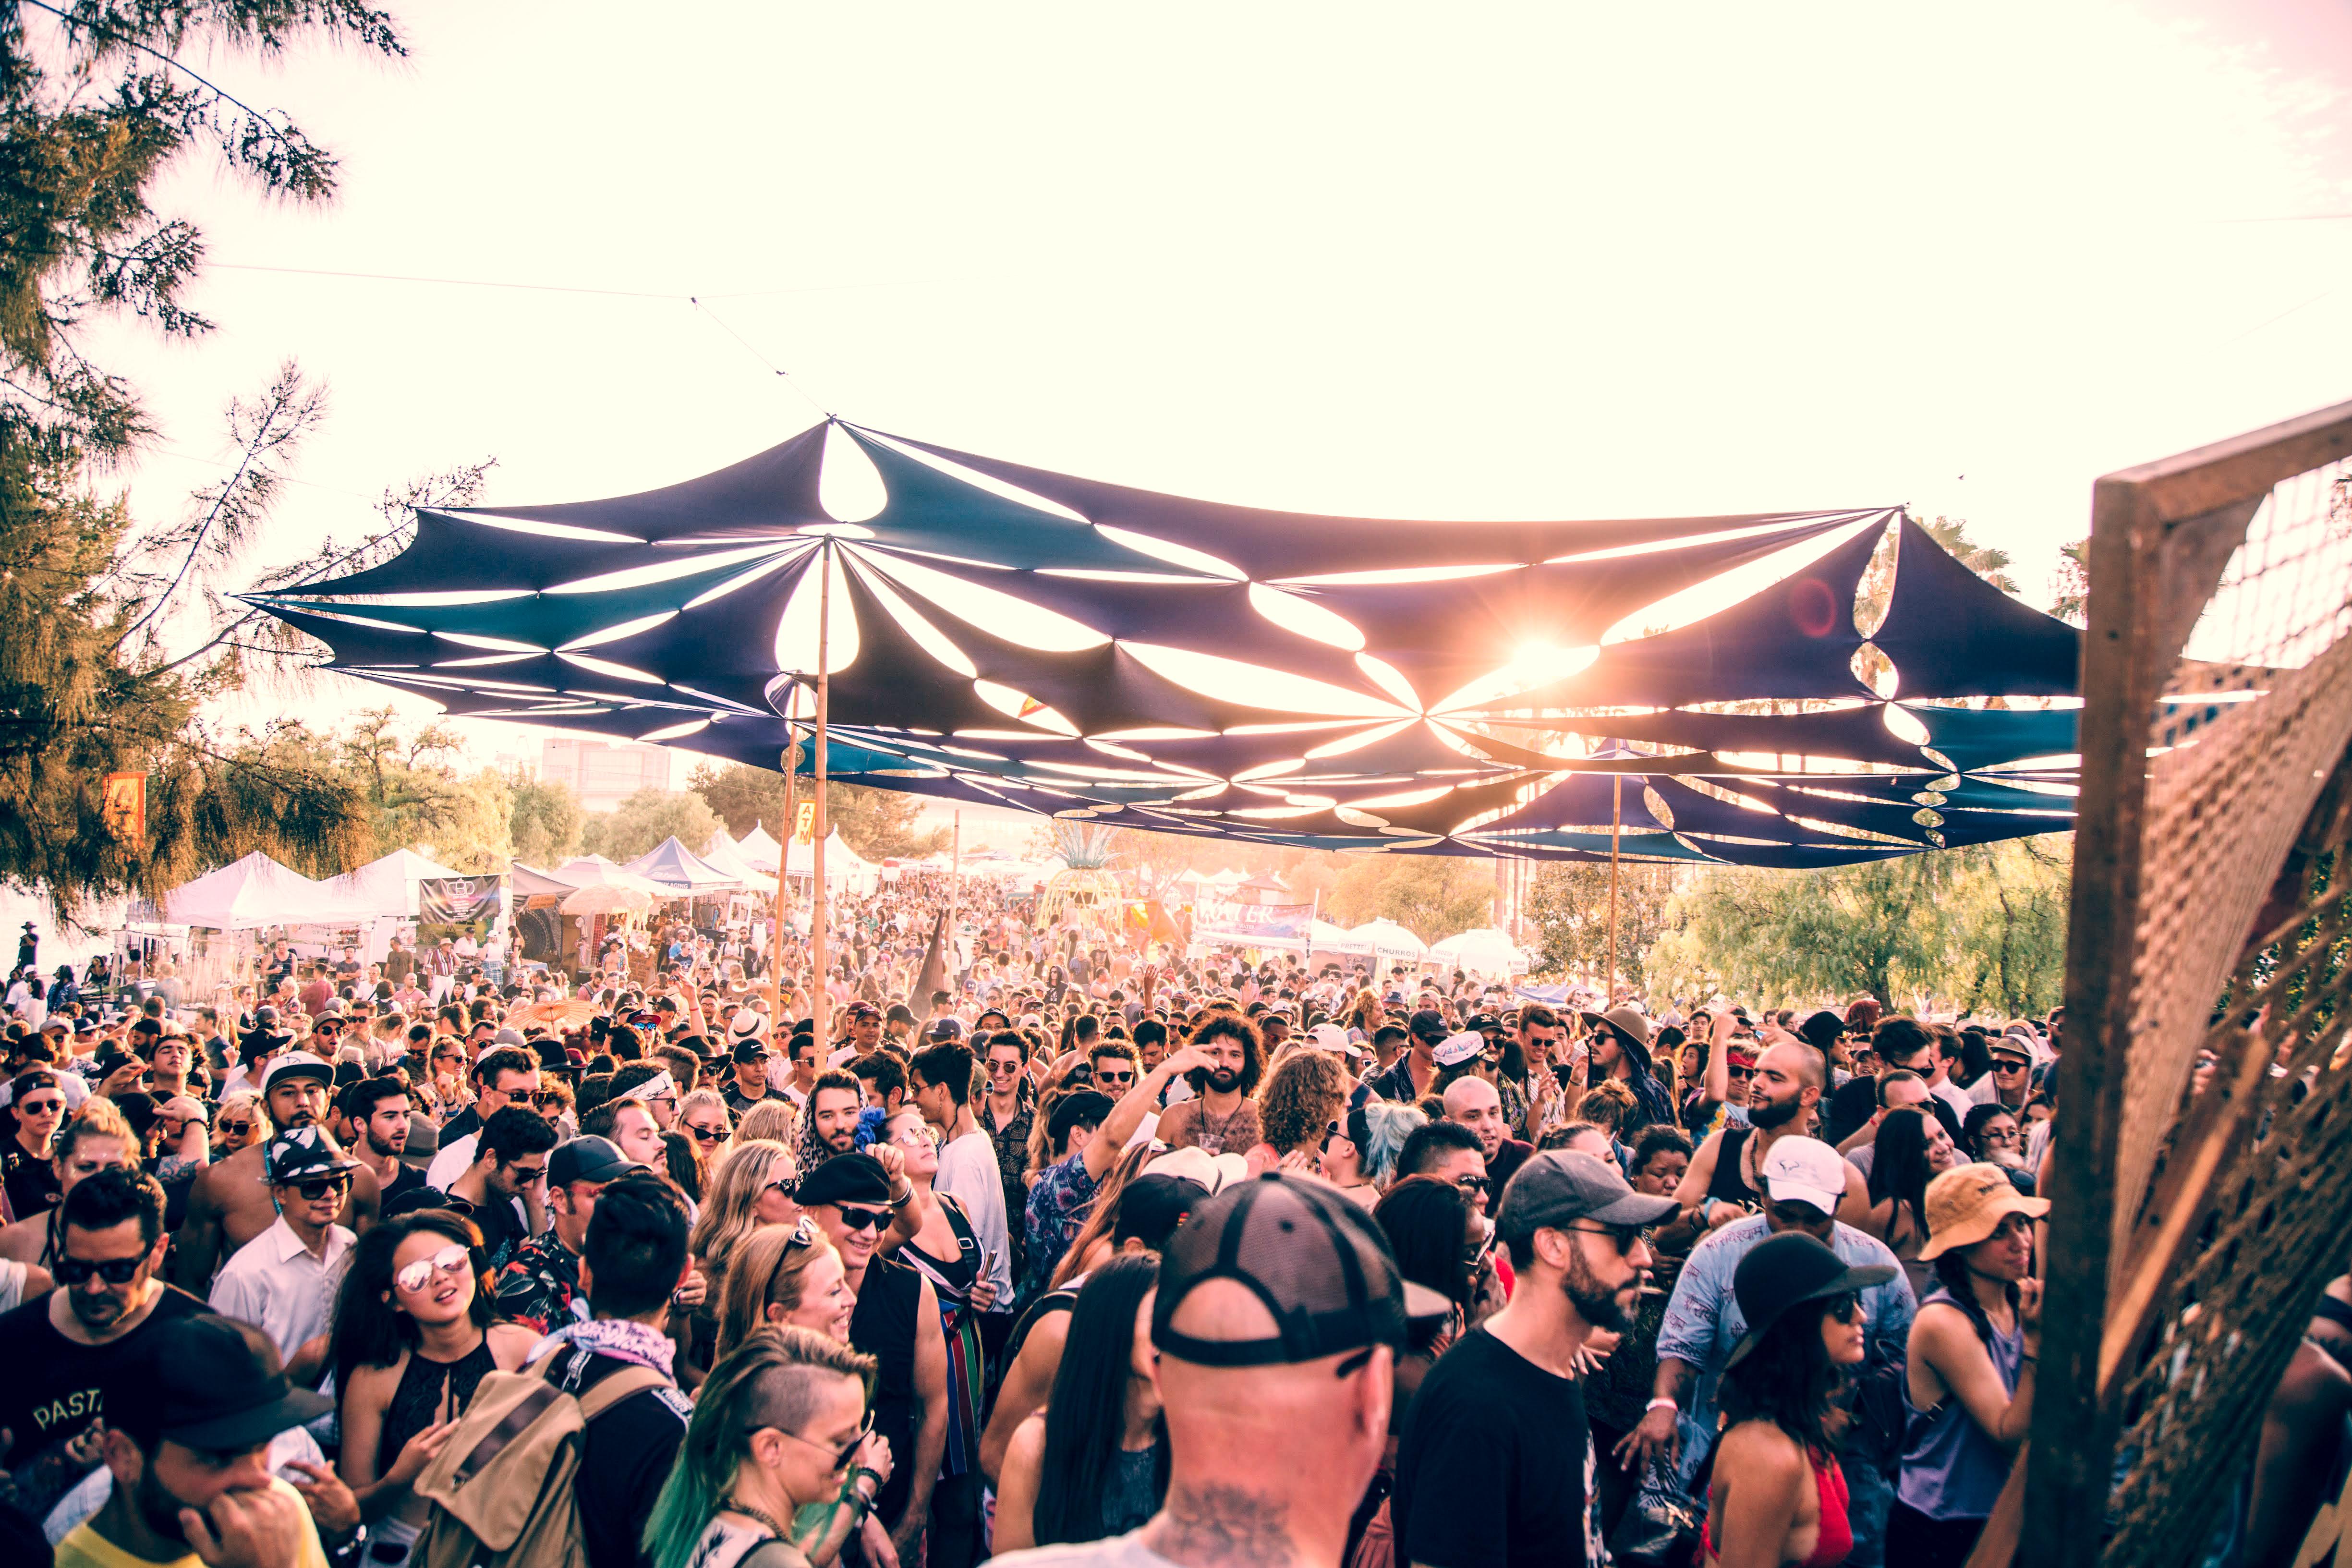 Love Long Beach Returns To Long Beach This Summer With Stellar Lineup